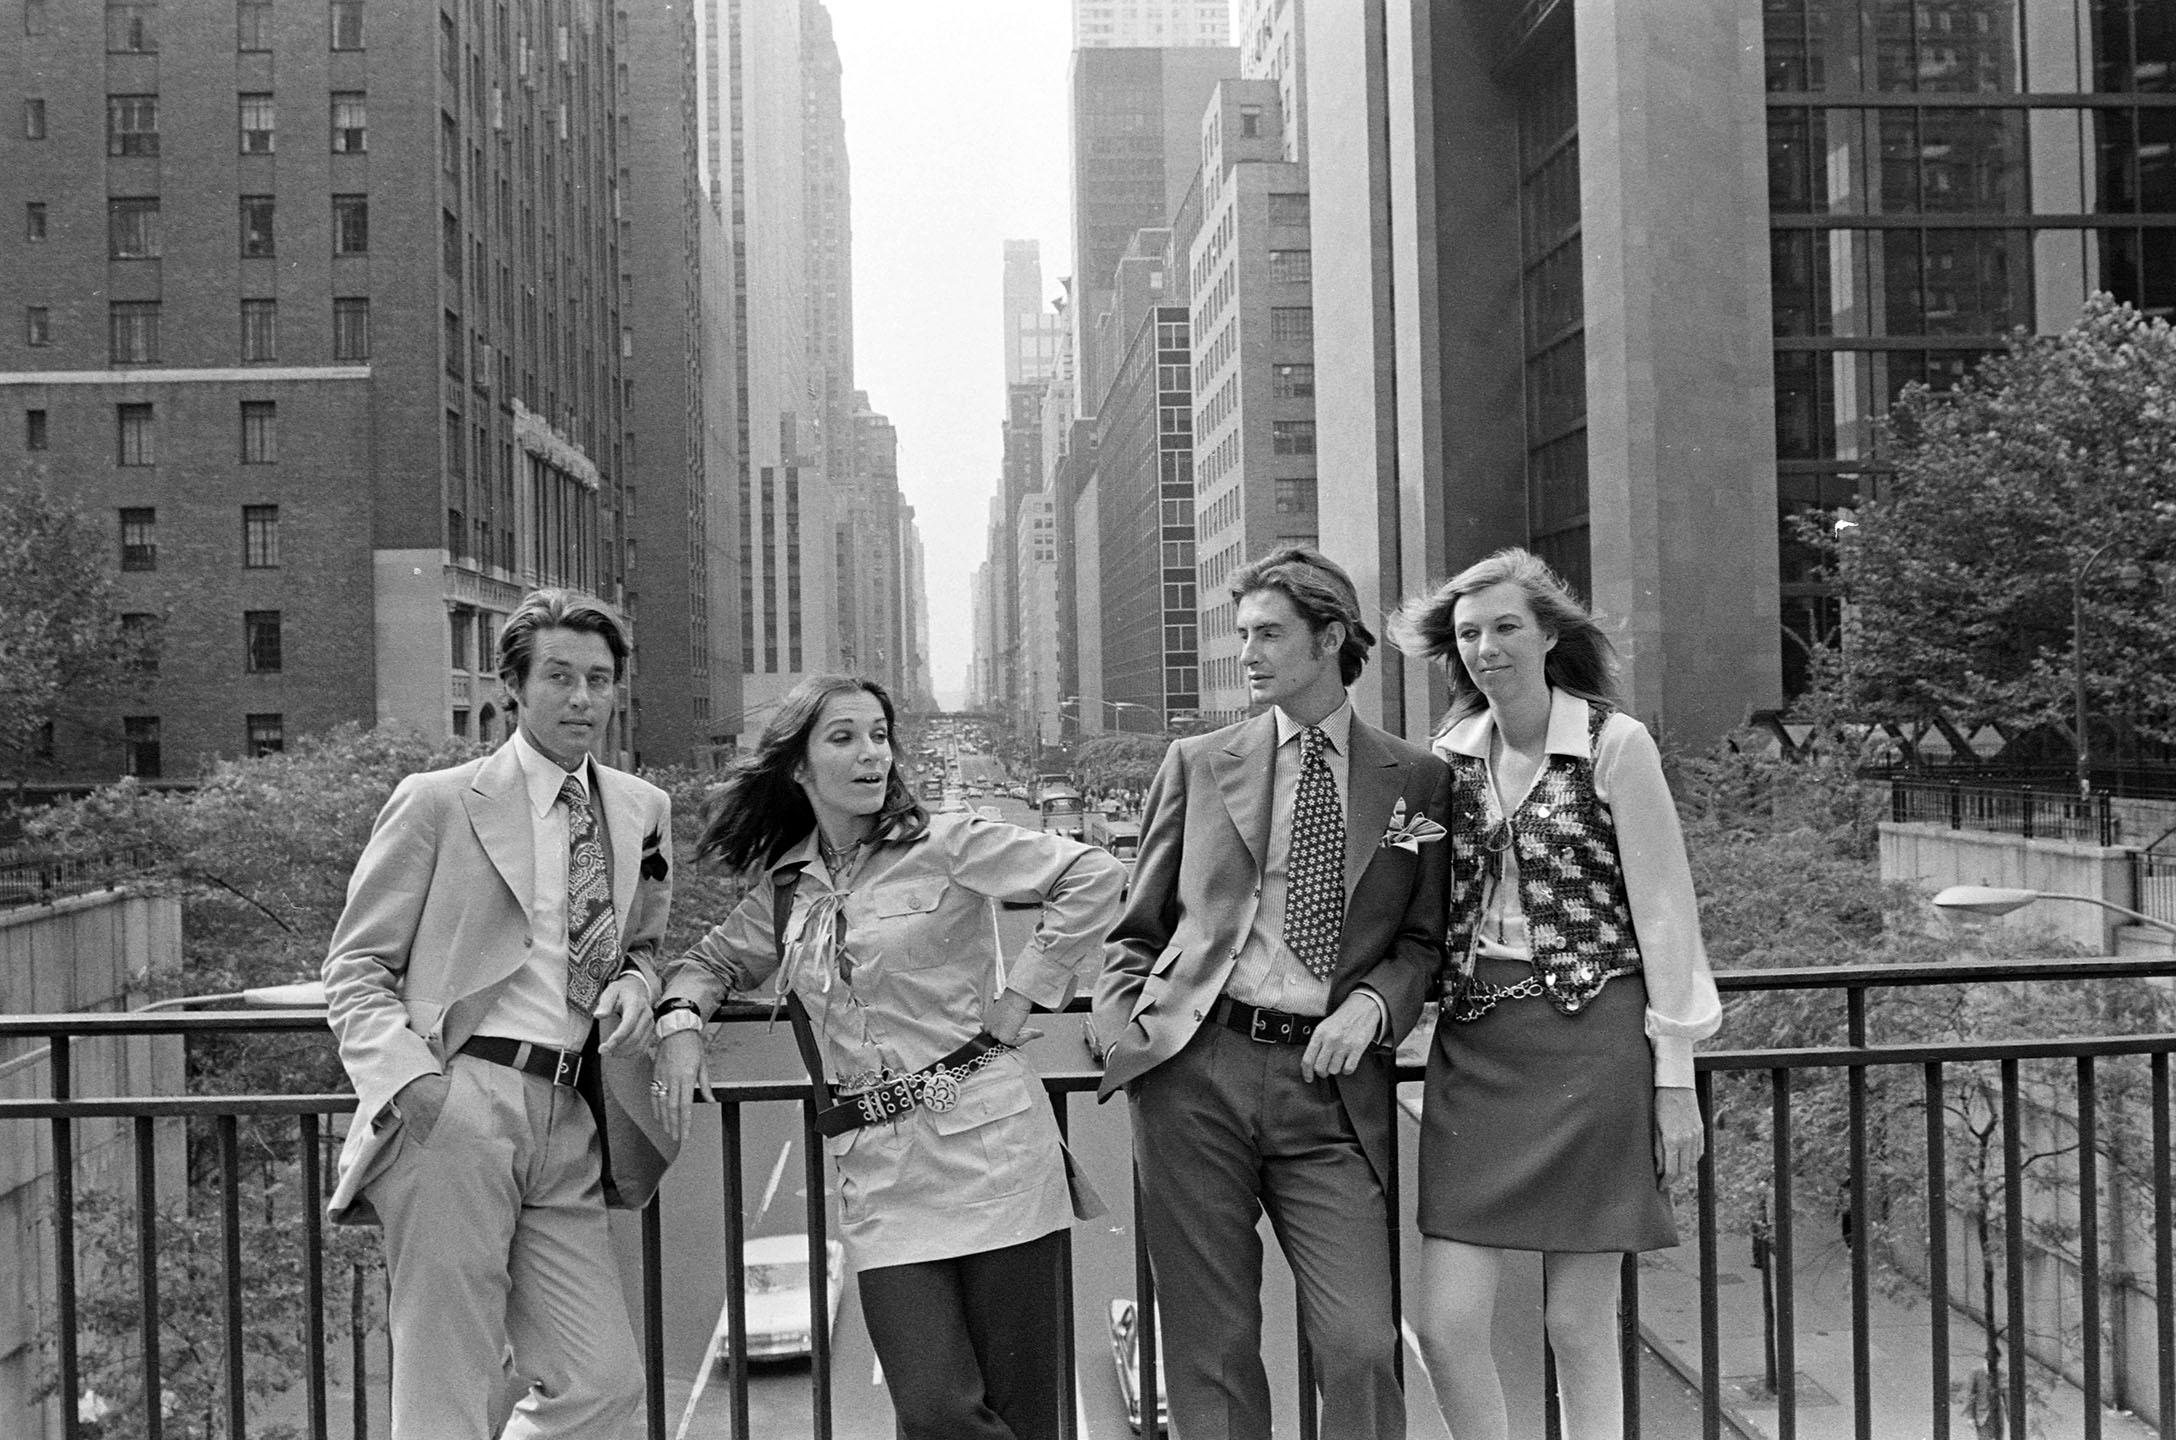 Designer Roy Halston, fashion editor Frances Stein, fashion executive Joanne Creveling and designer Joel Schumacher photographed along East 42nd St in New York City.